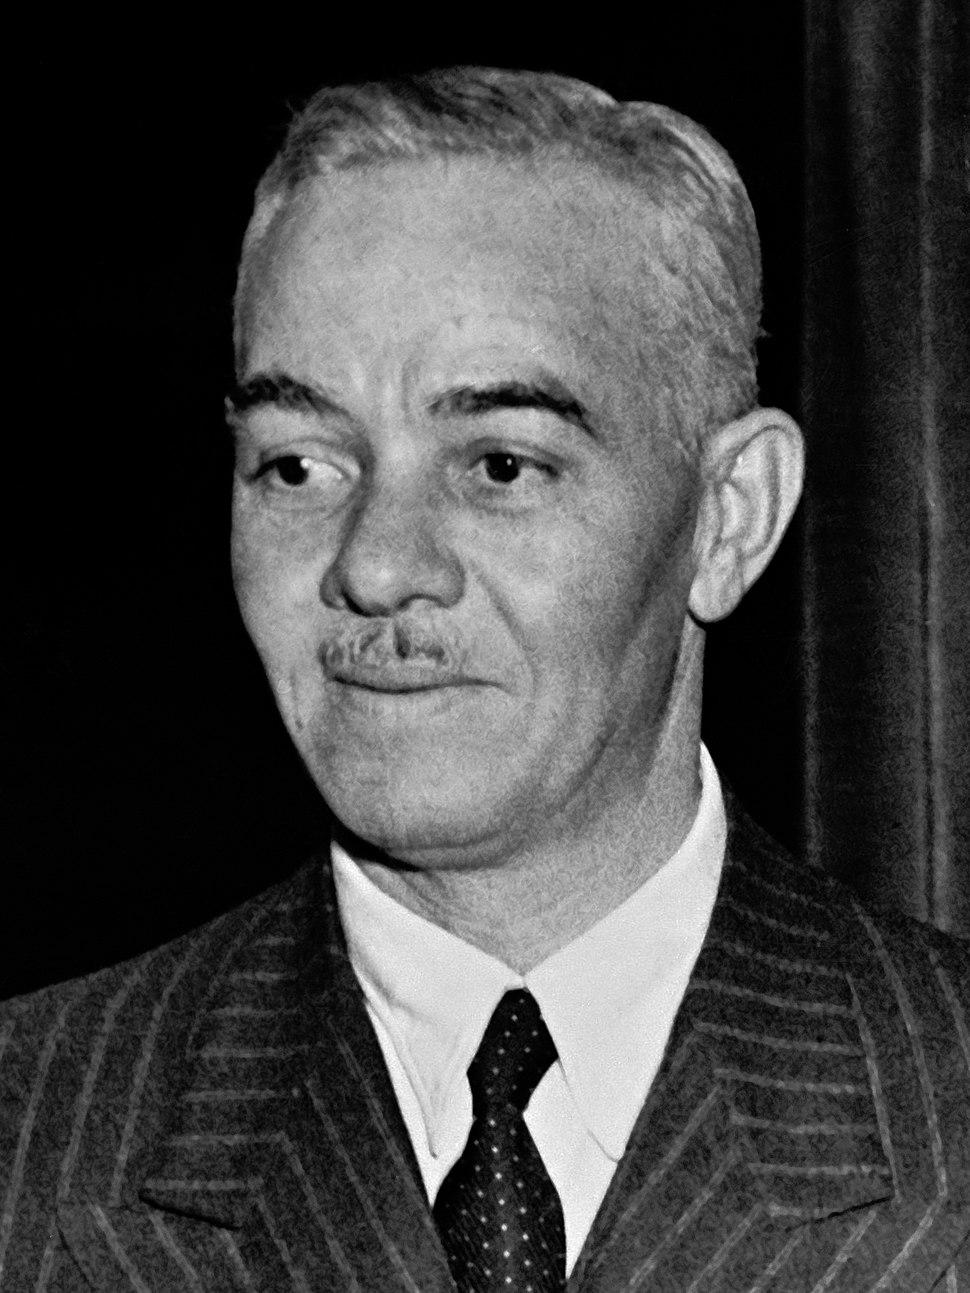 Ibrahim Abdul Hadi Pasha (1948)